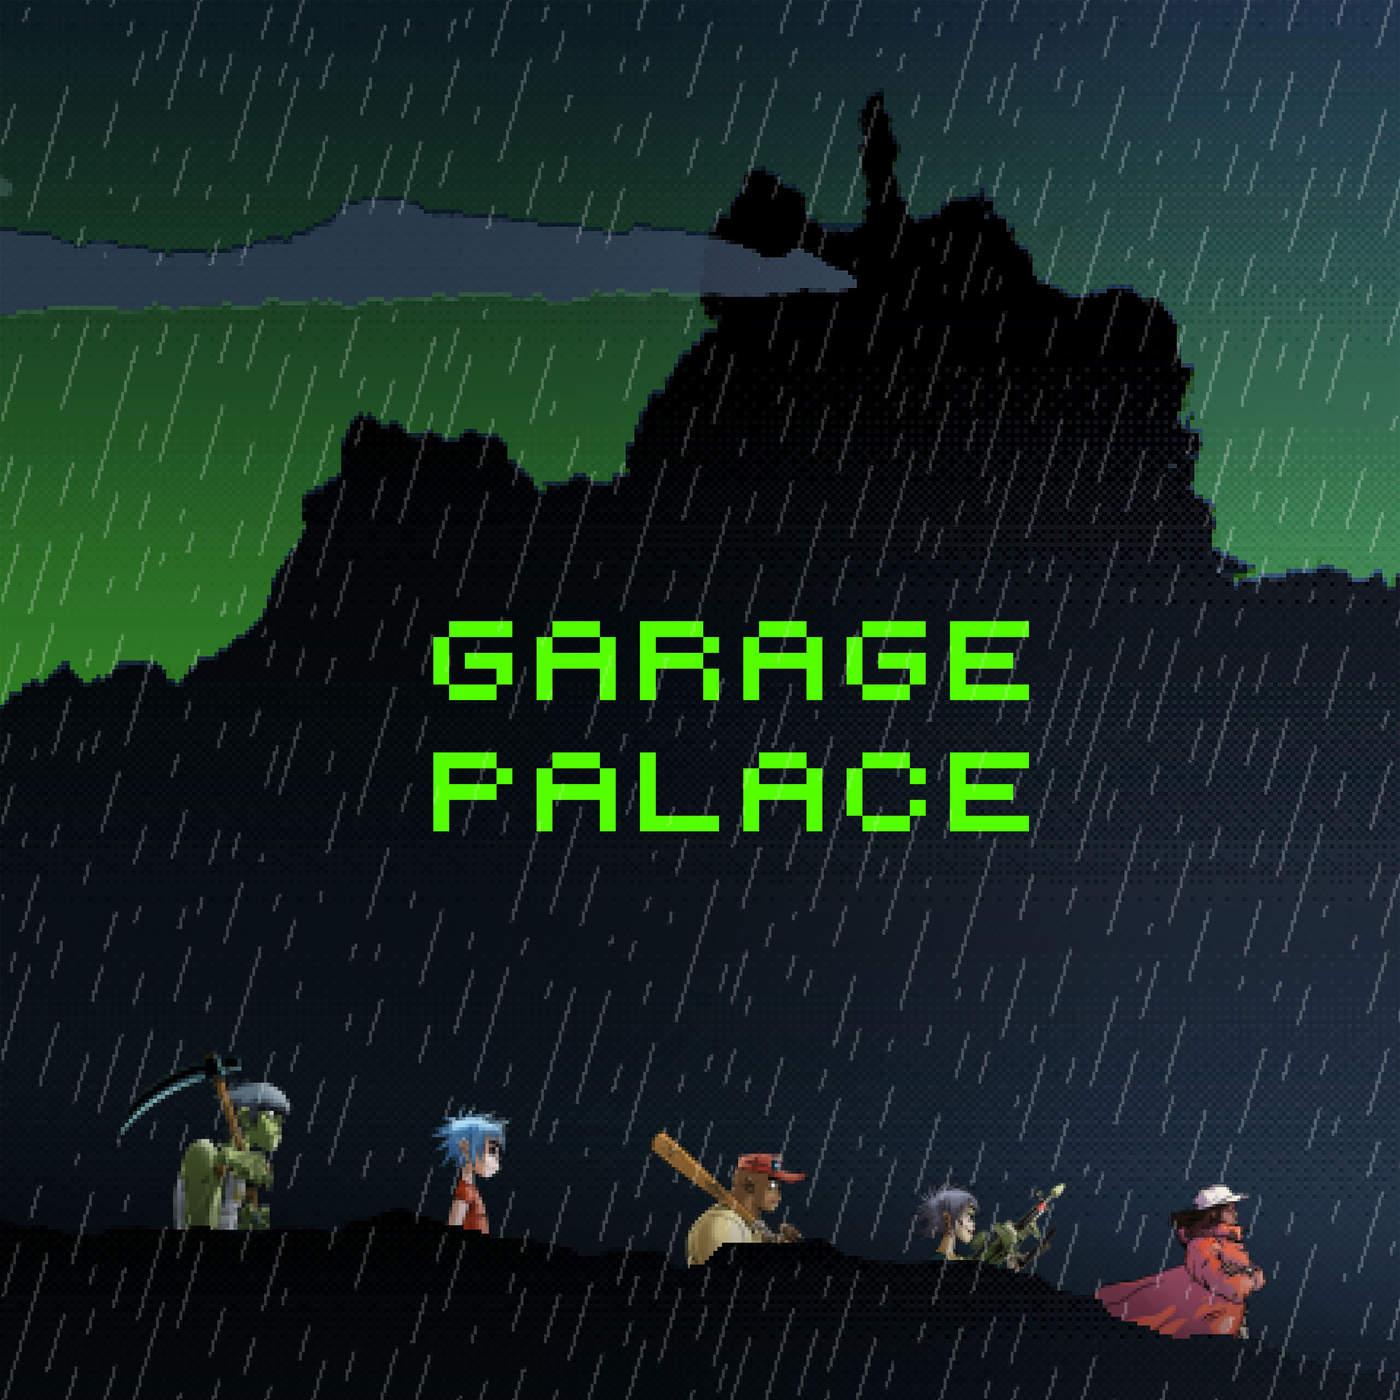 Gorillaz - Garage Palace (feat. Little Simz) - Single